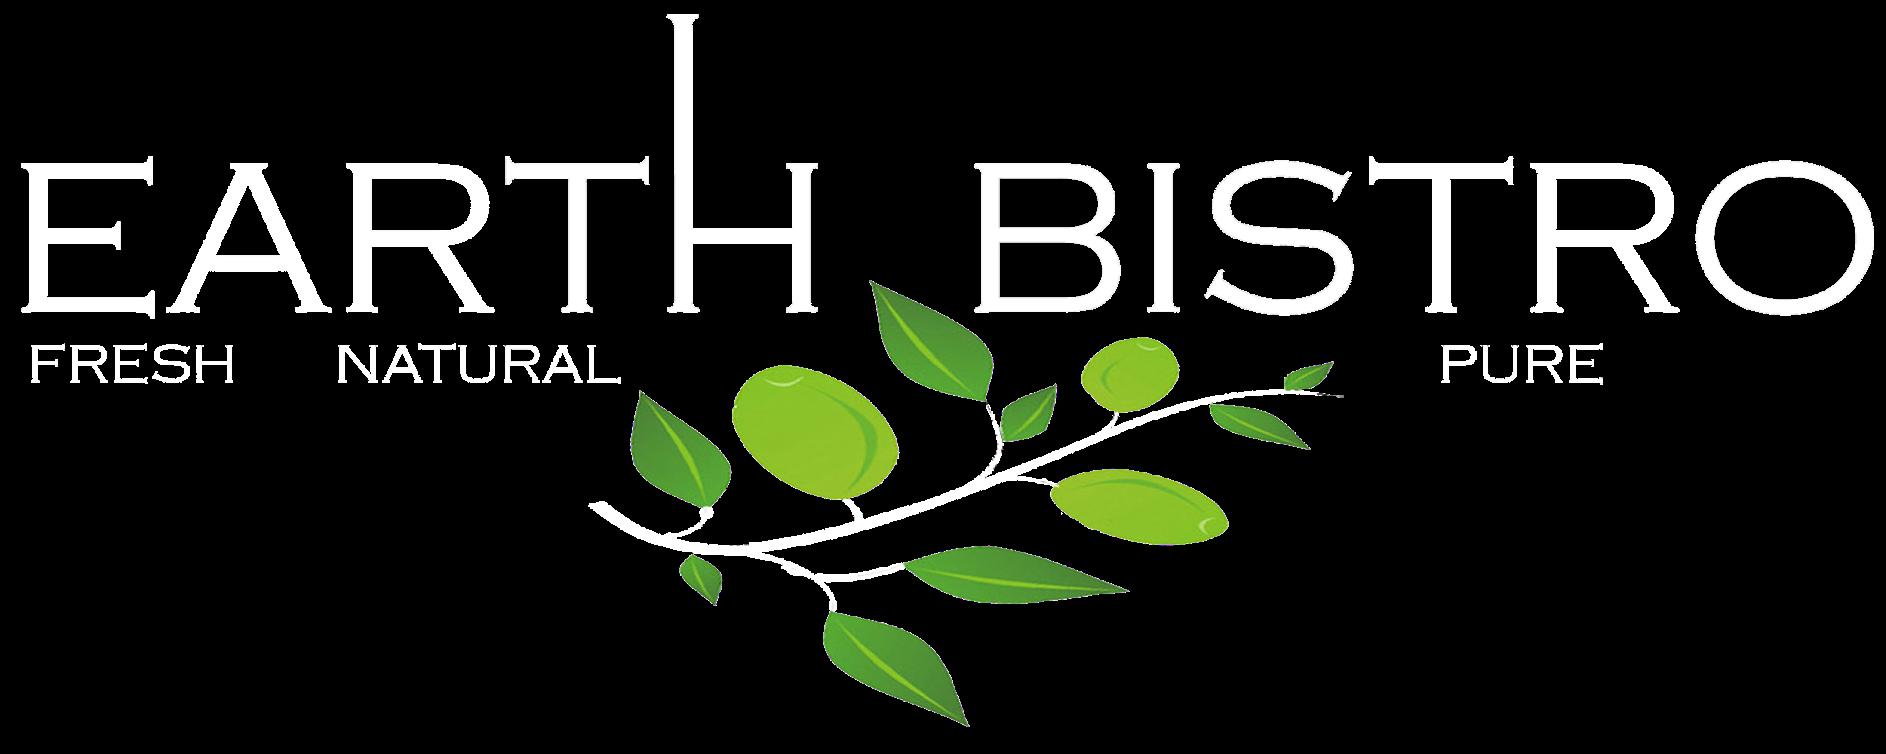 Menu | Earth Bistro | Restaurants | Pinterest | Menu and Earth